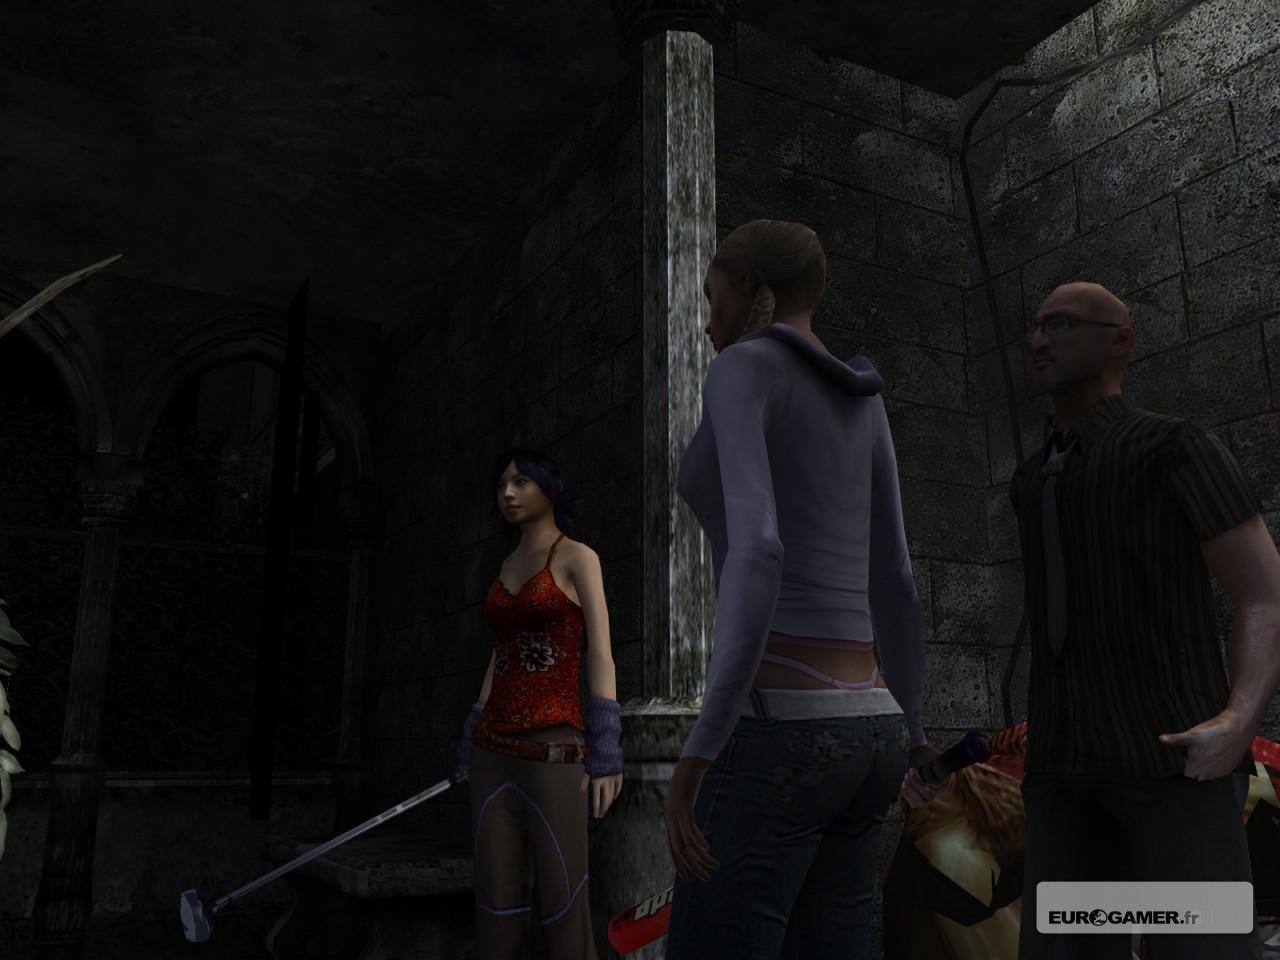 Obscure II desktop wallpaper 24 of 48 Video Game 1280x960